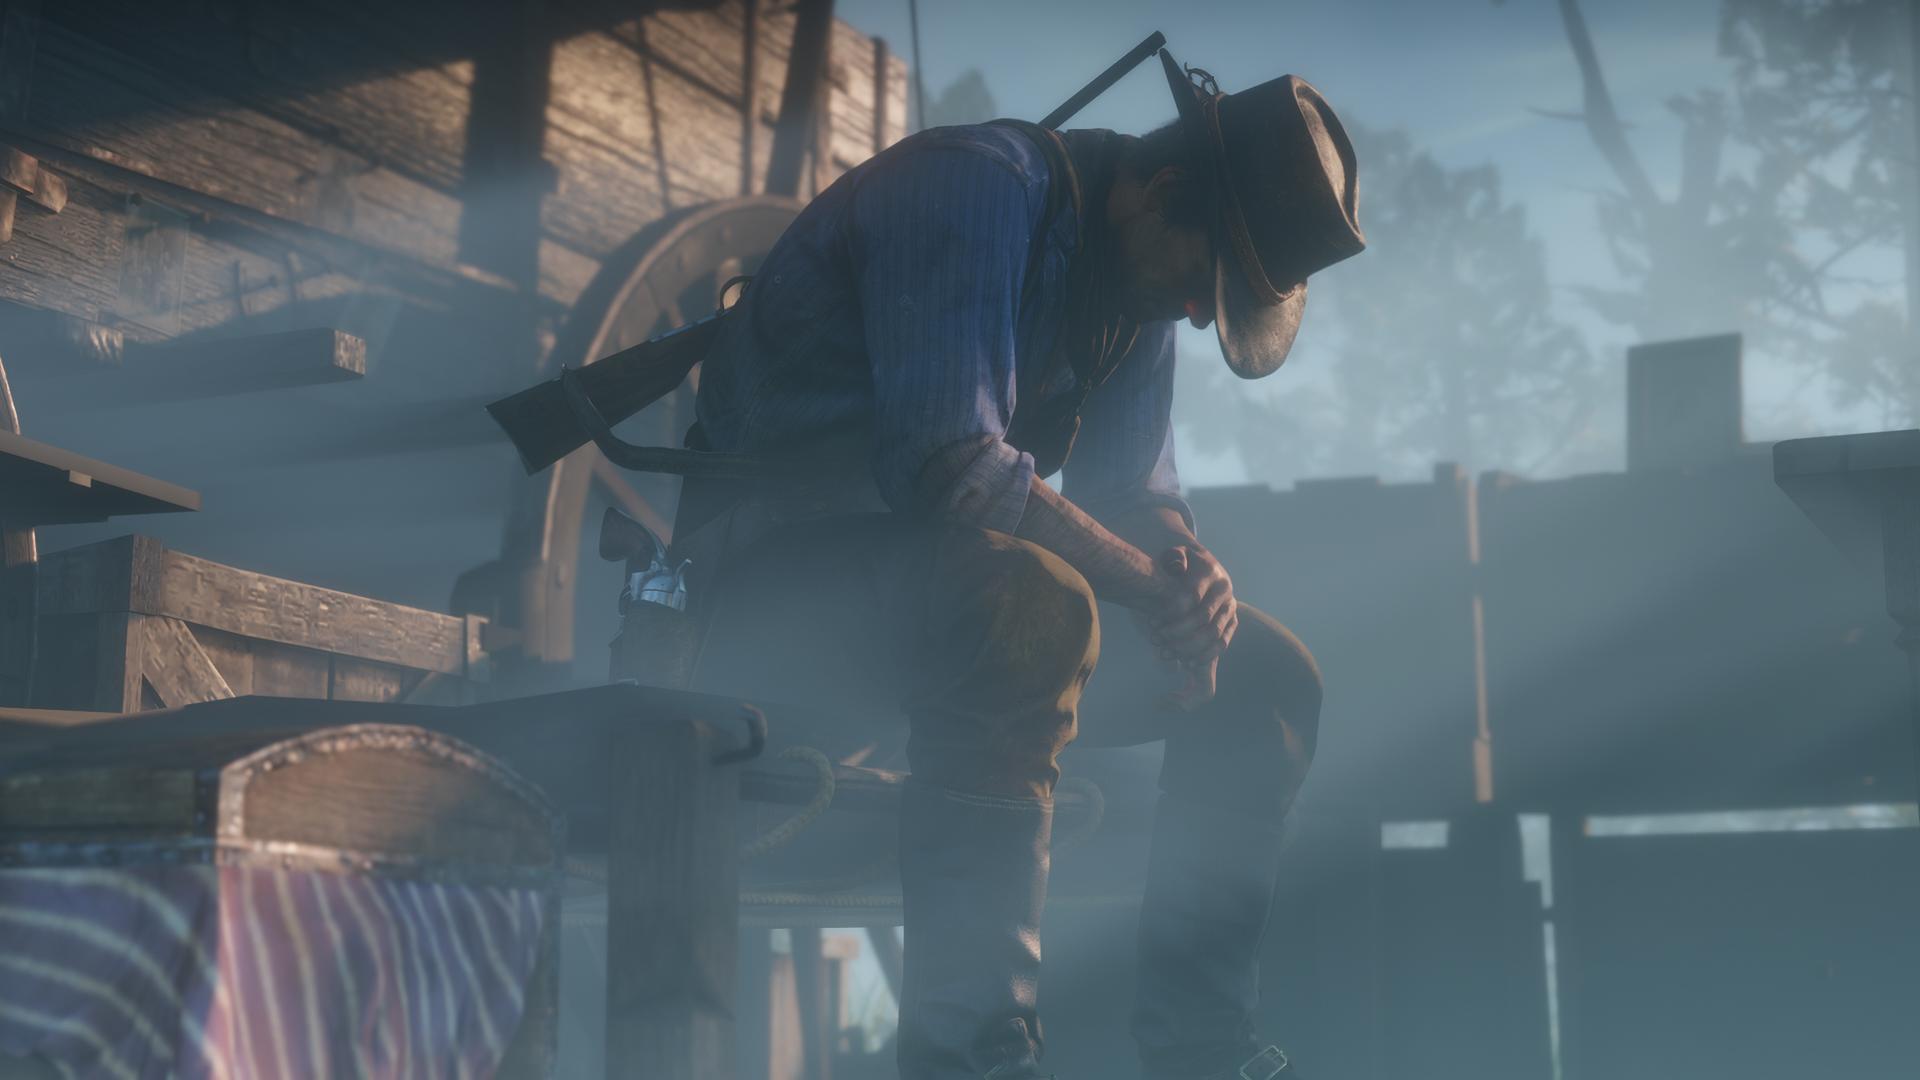 Как пройти Red Dead Redemption 2 на 100%?